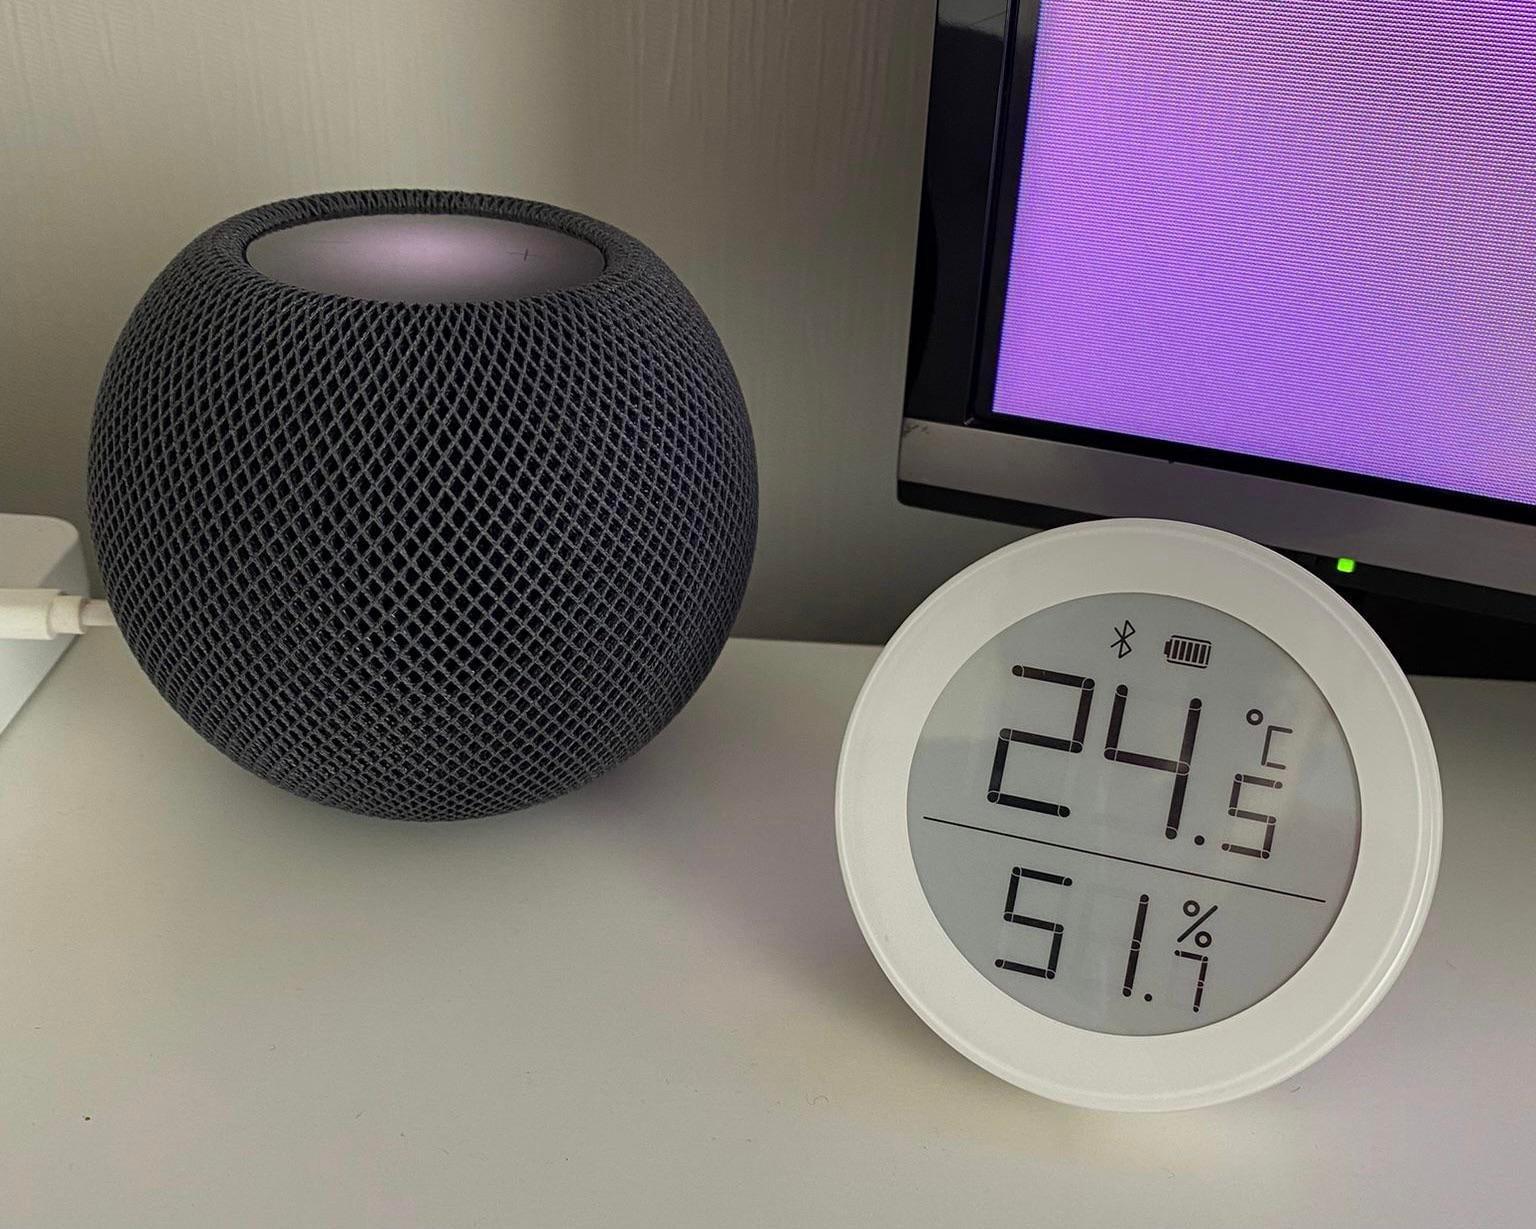 HomeKit thermometer humidity sensor